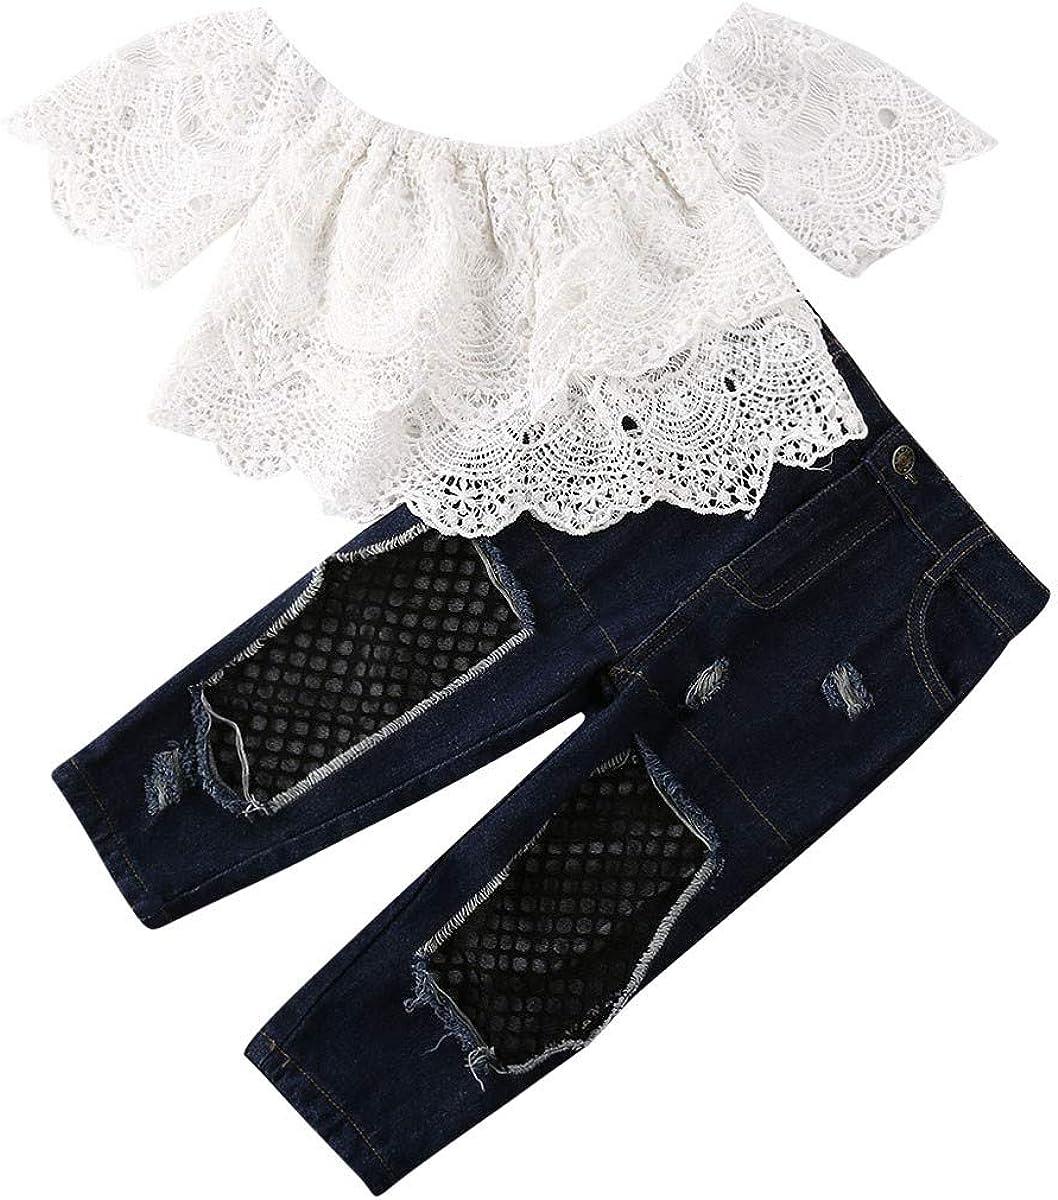 2Pcs Set Fashion Toddler Max 80% OFF Kids Baby cheap Top+Floral Girl Denim T-Shirt